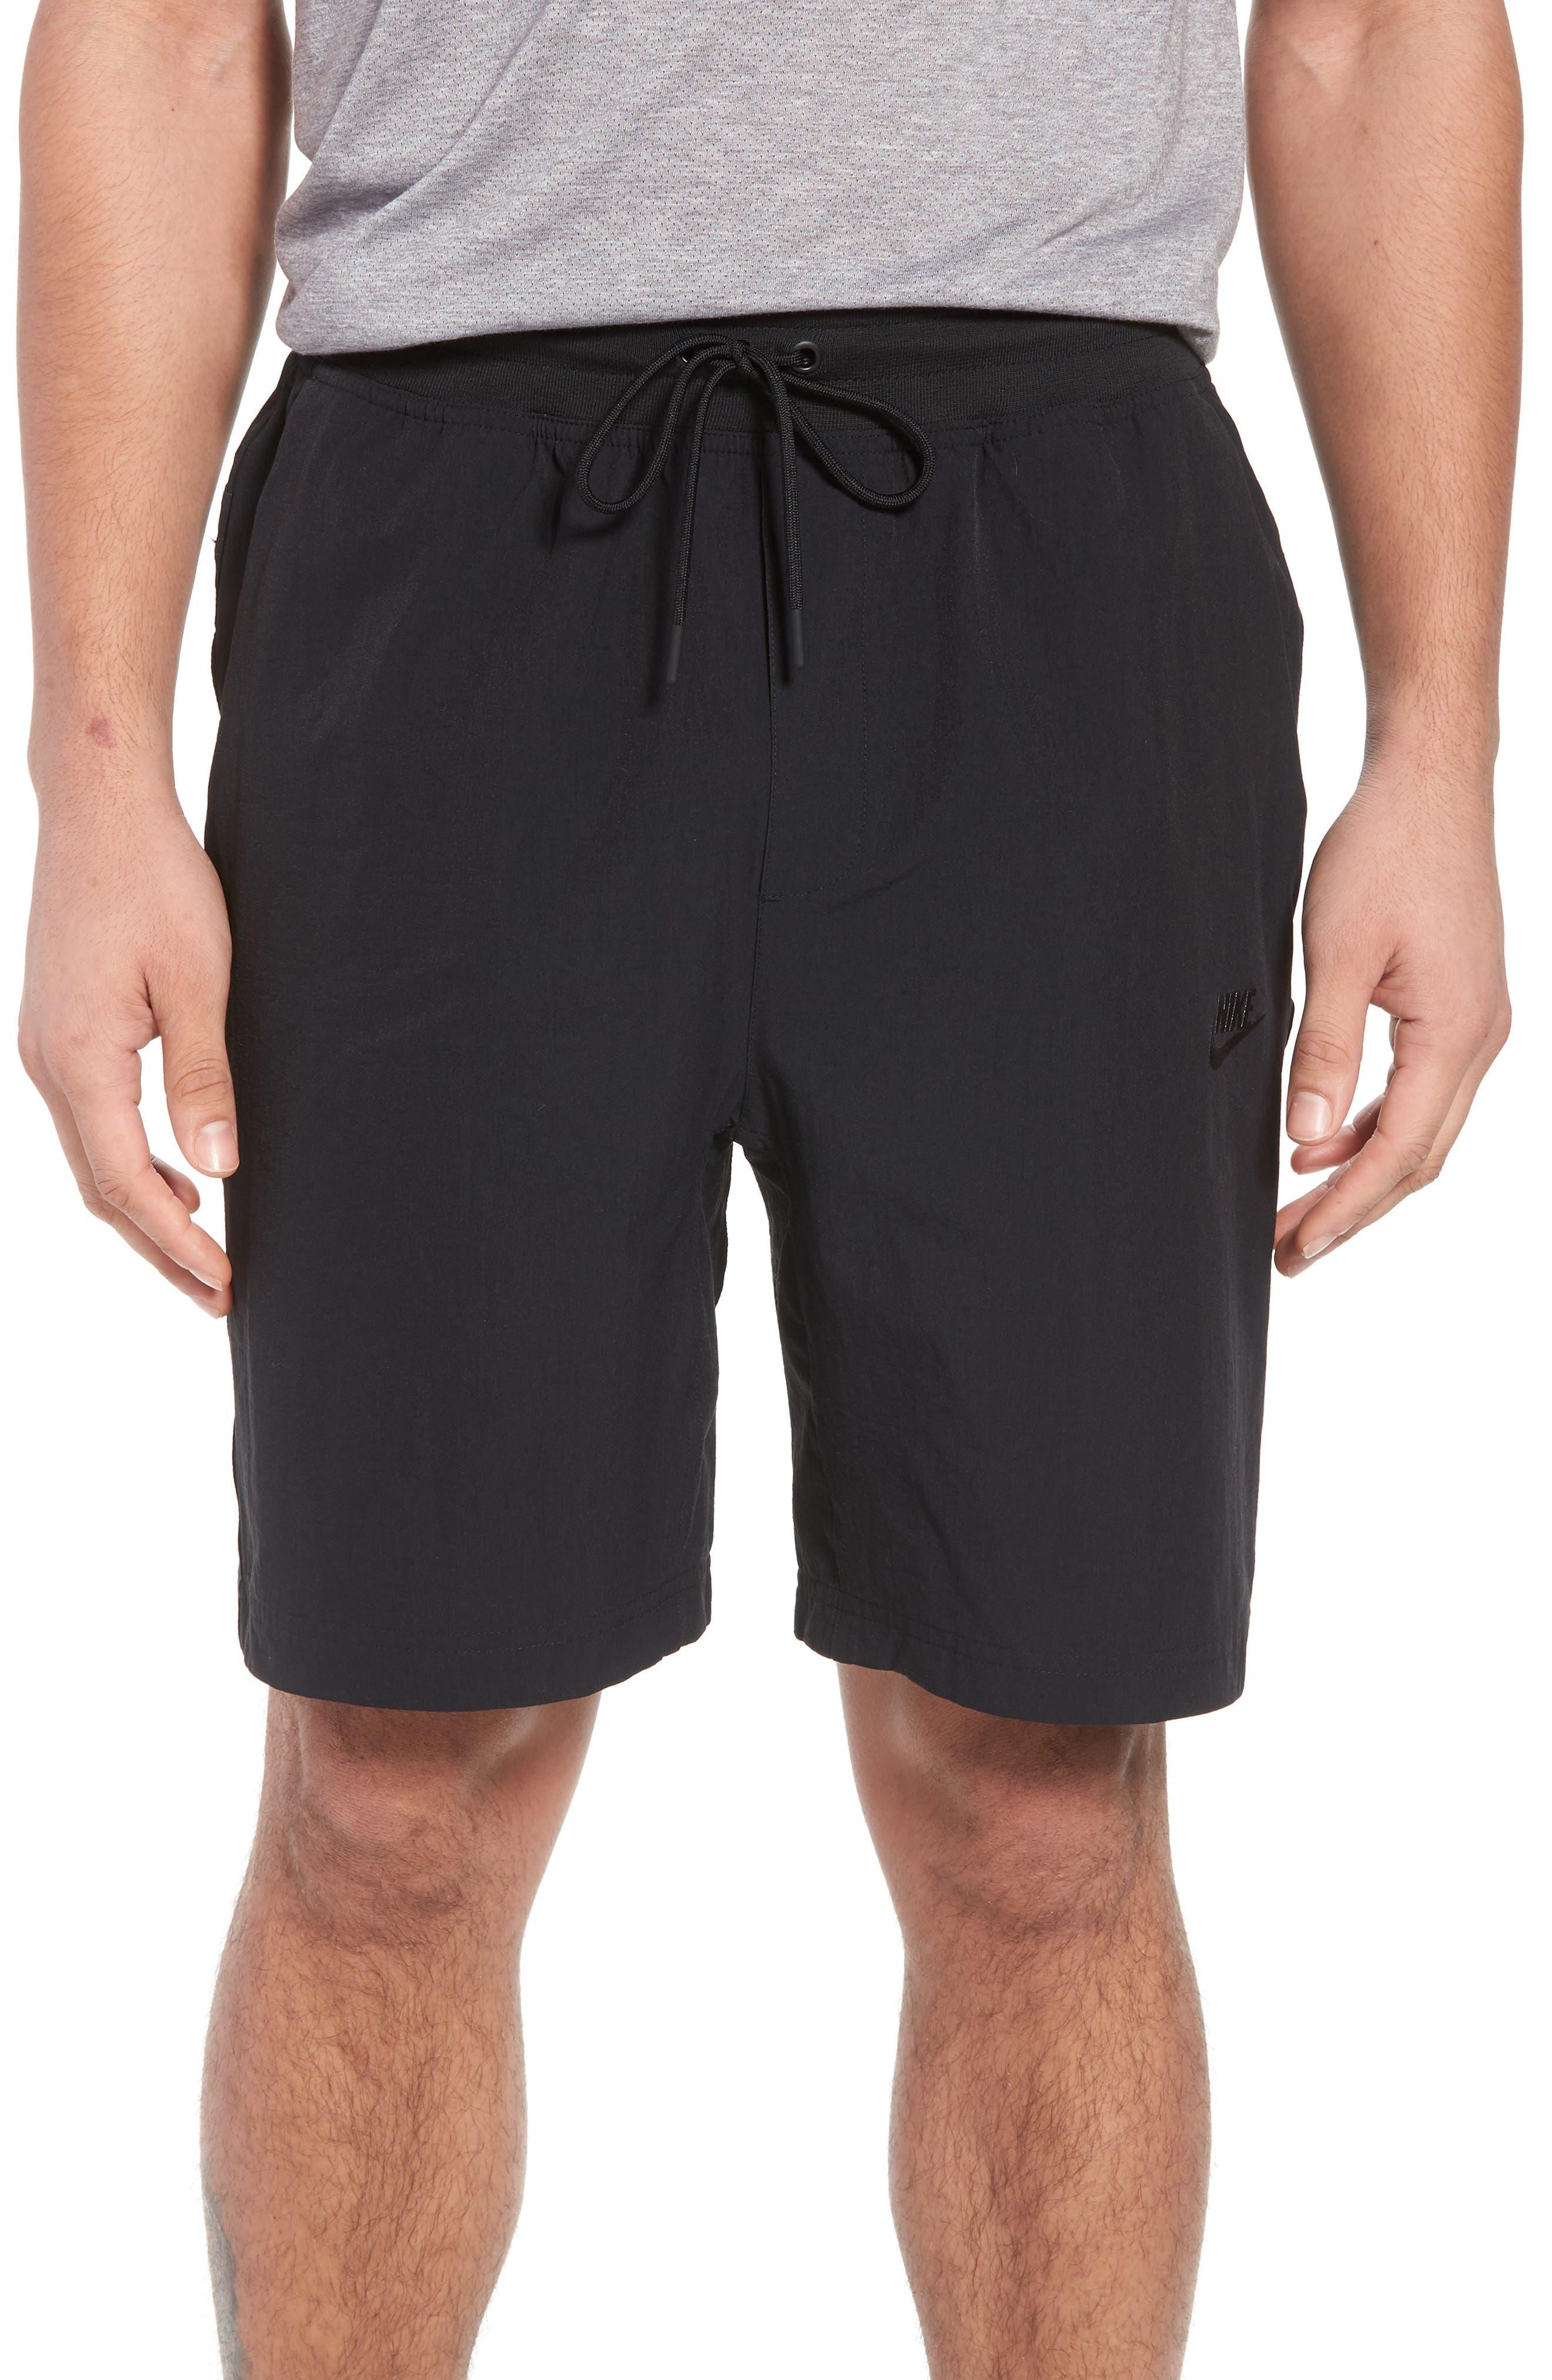 Sportswear Woven Shorts,                         Main,                         color, Black/ Black